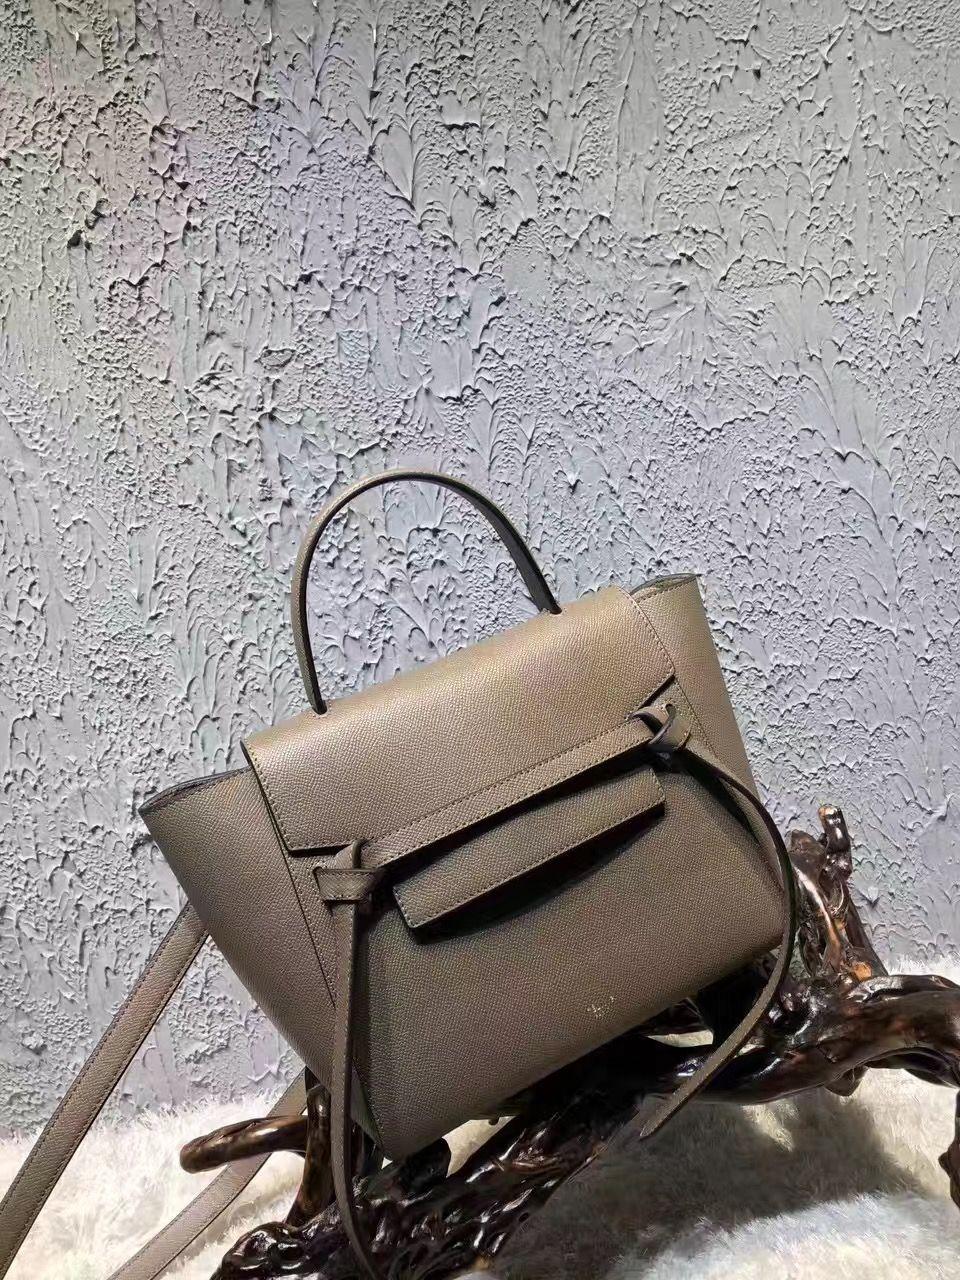 c068e553420b Celine Micro Belt Handbag In Iron Grey Grained Calfskin 2017 ...